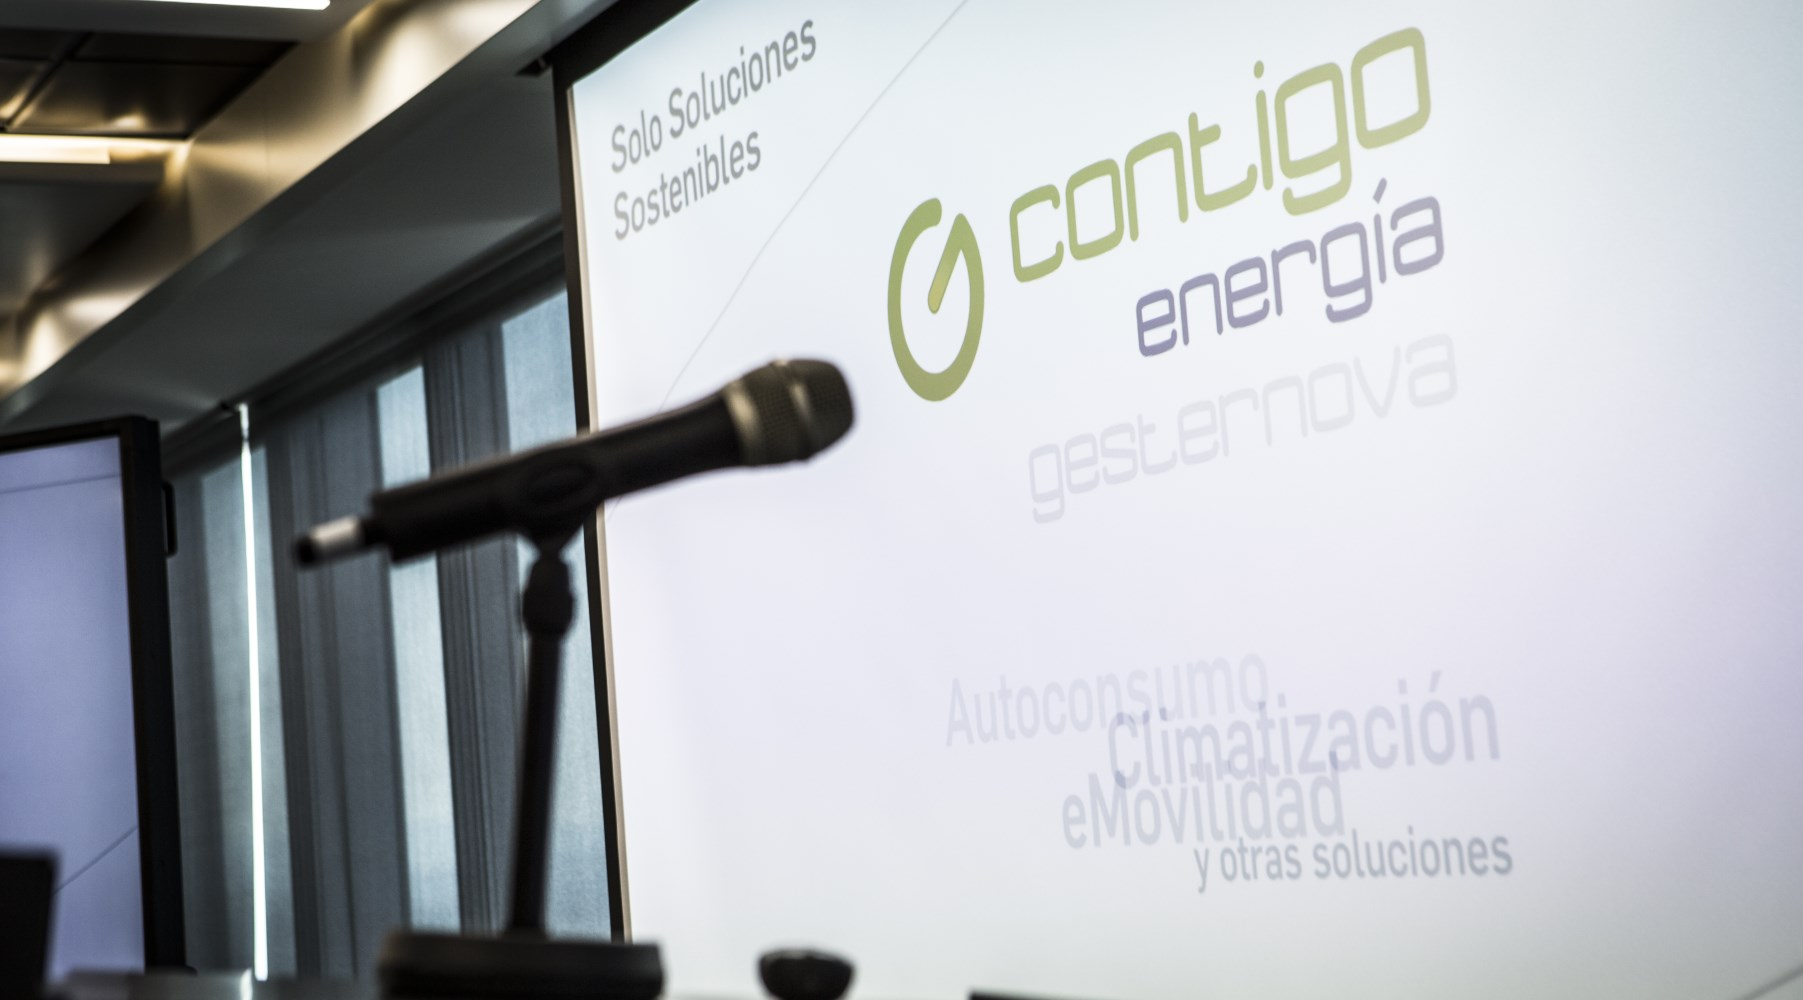 Contigo Energía: Solución Sostenible De Gesternova